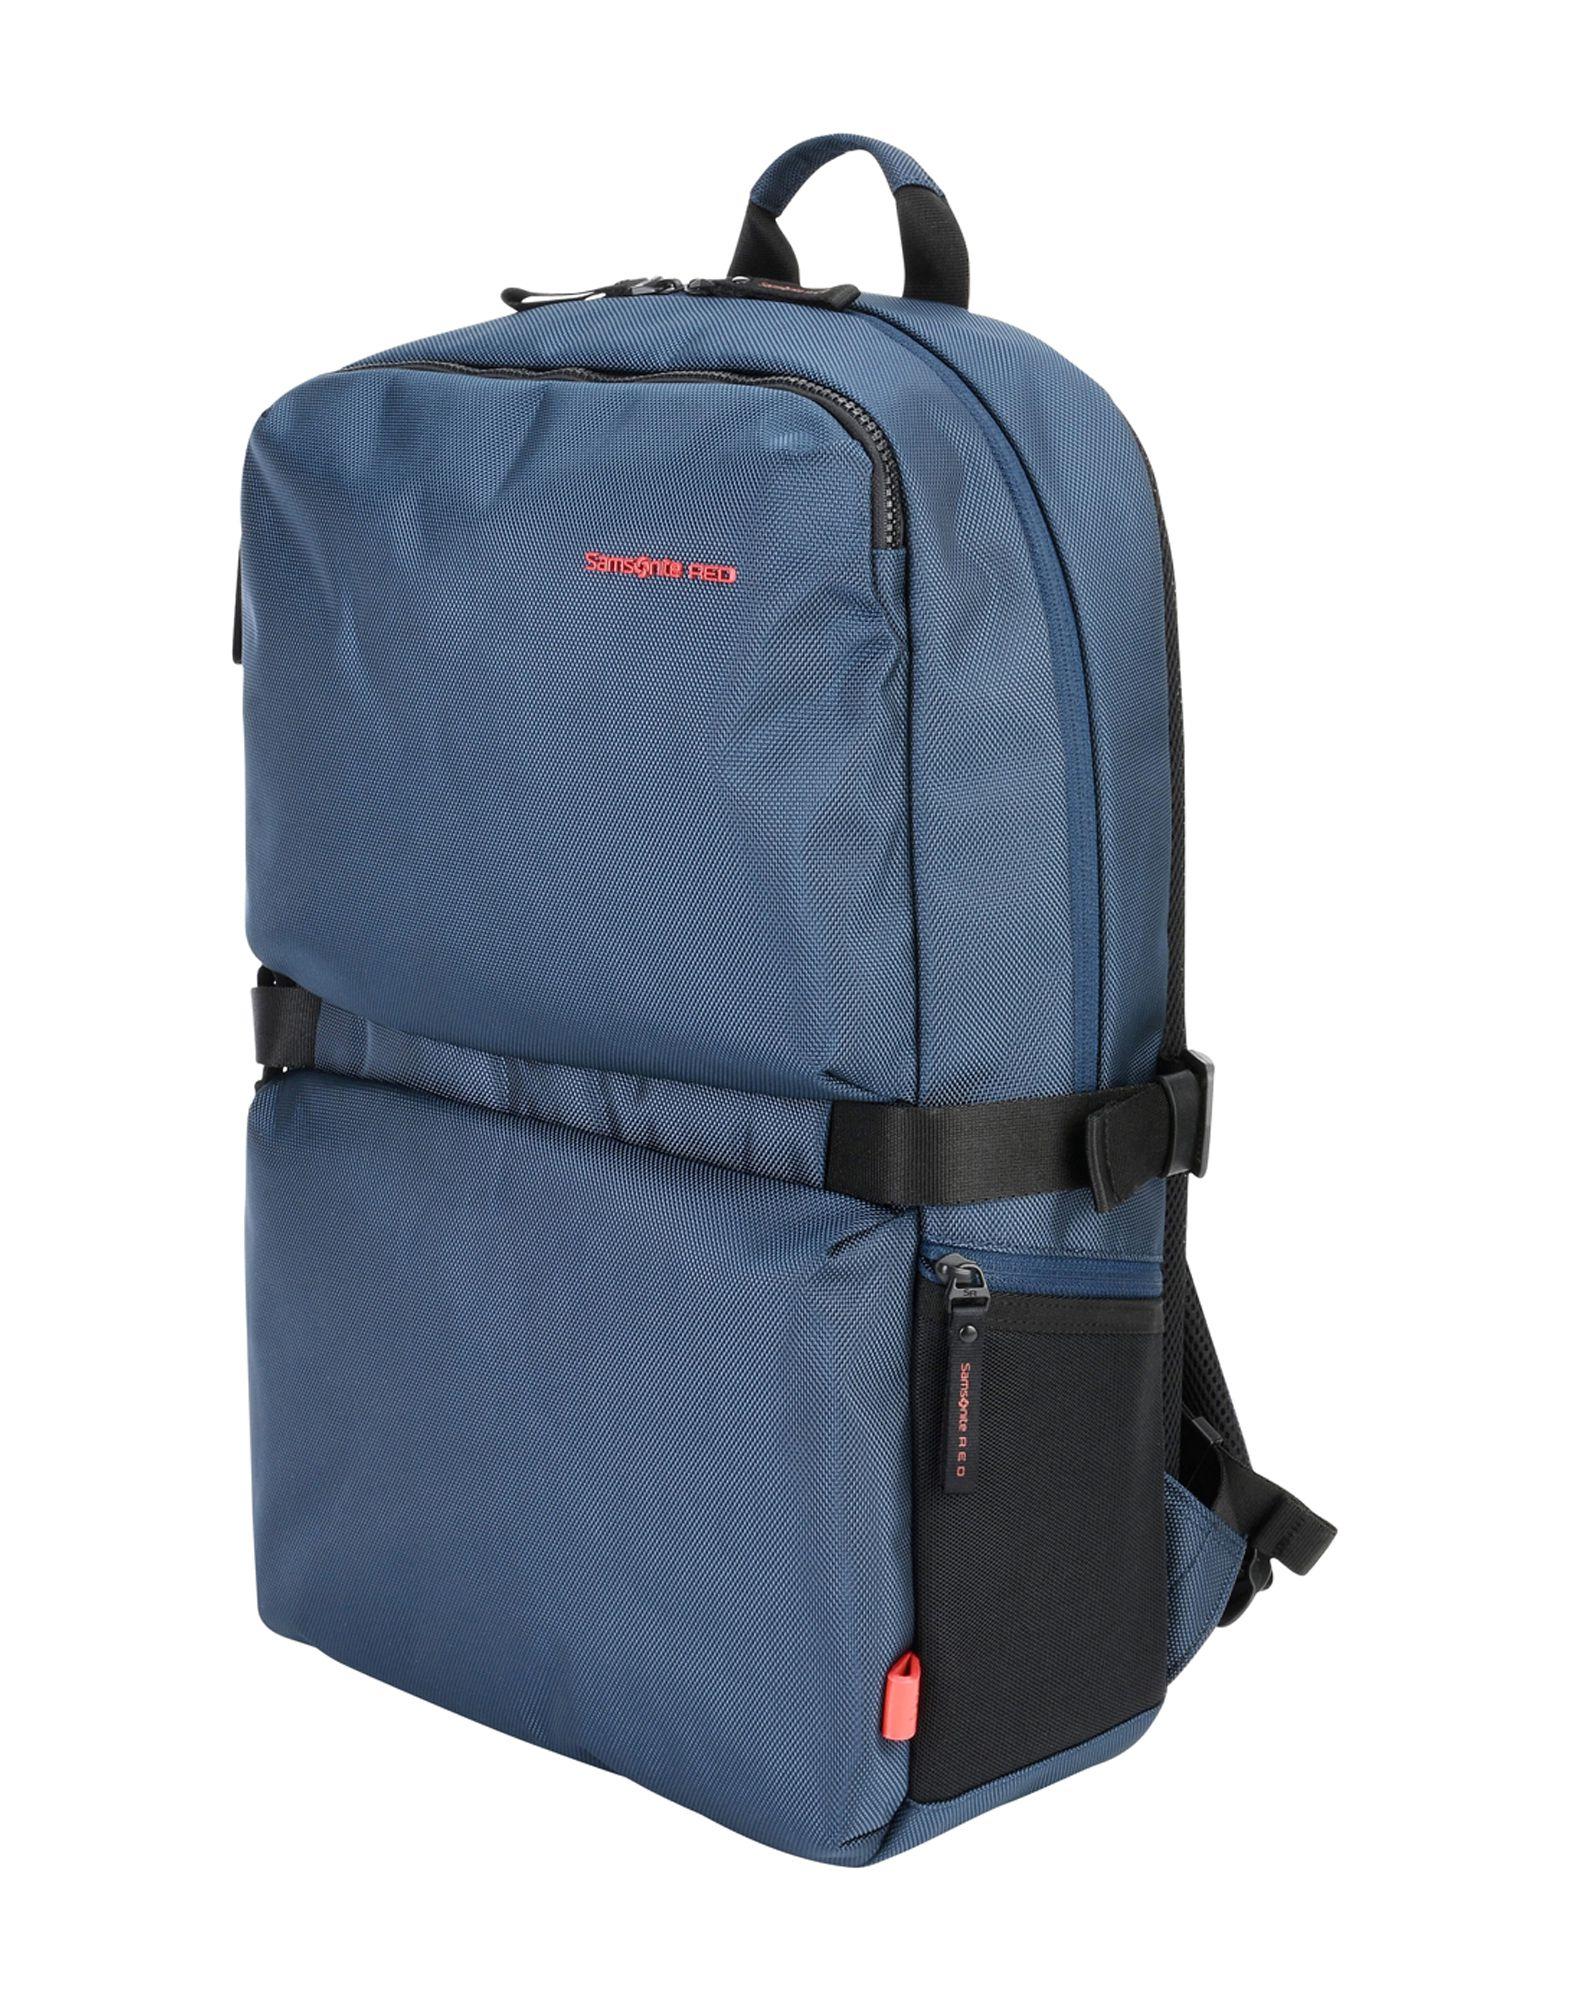 Zaini & Marsupi Samsonite Red Clovel Backpack L - Uomo - Acquista online su